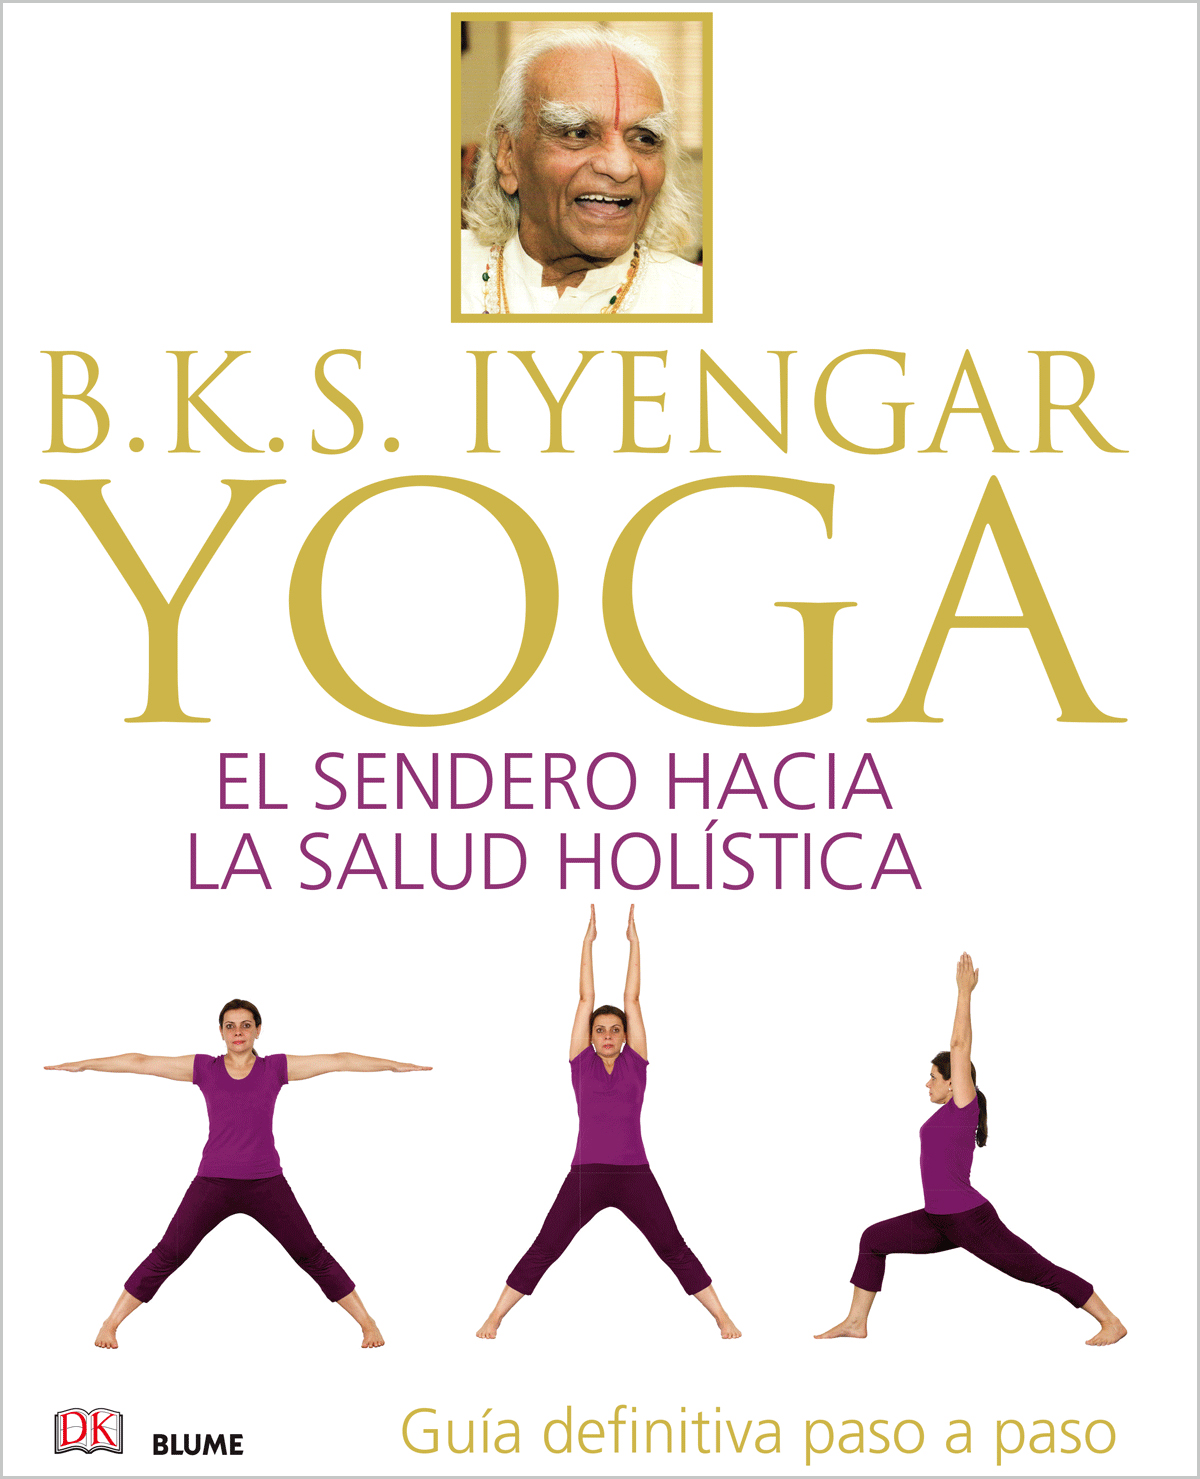 B.K.S. Iyengar. Yoga - Iyengar Bellur Krishnamachar Sundararaja